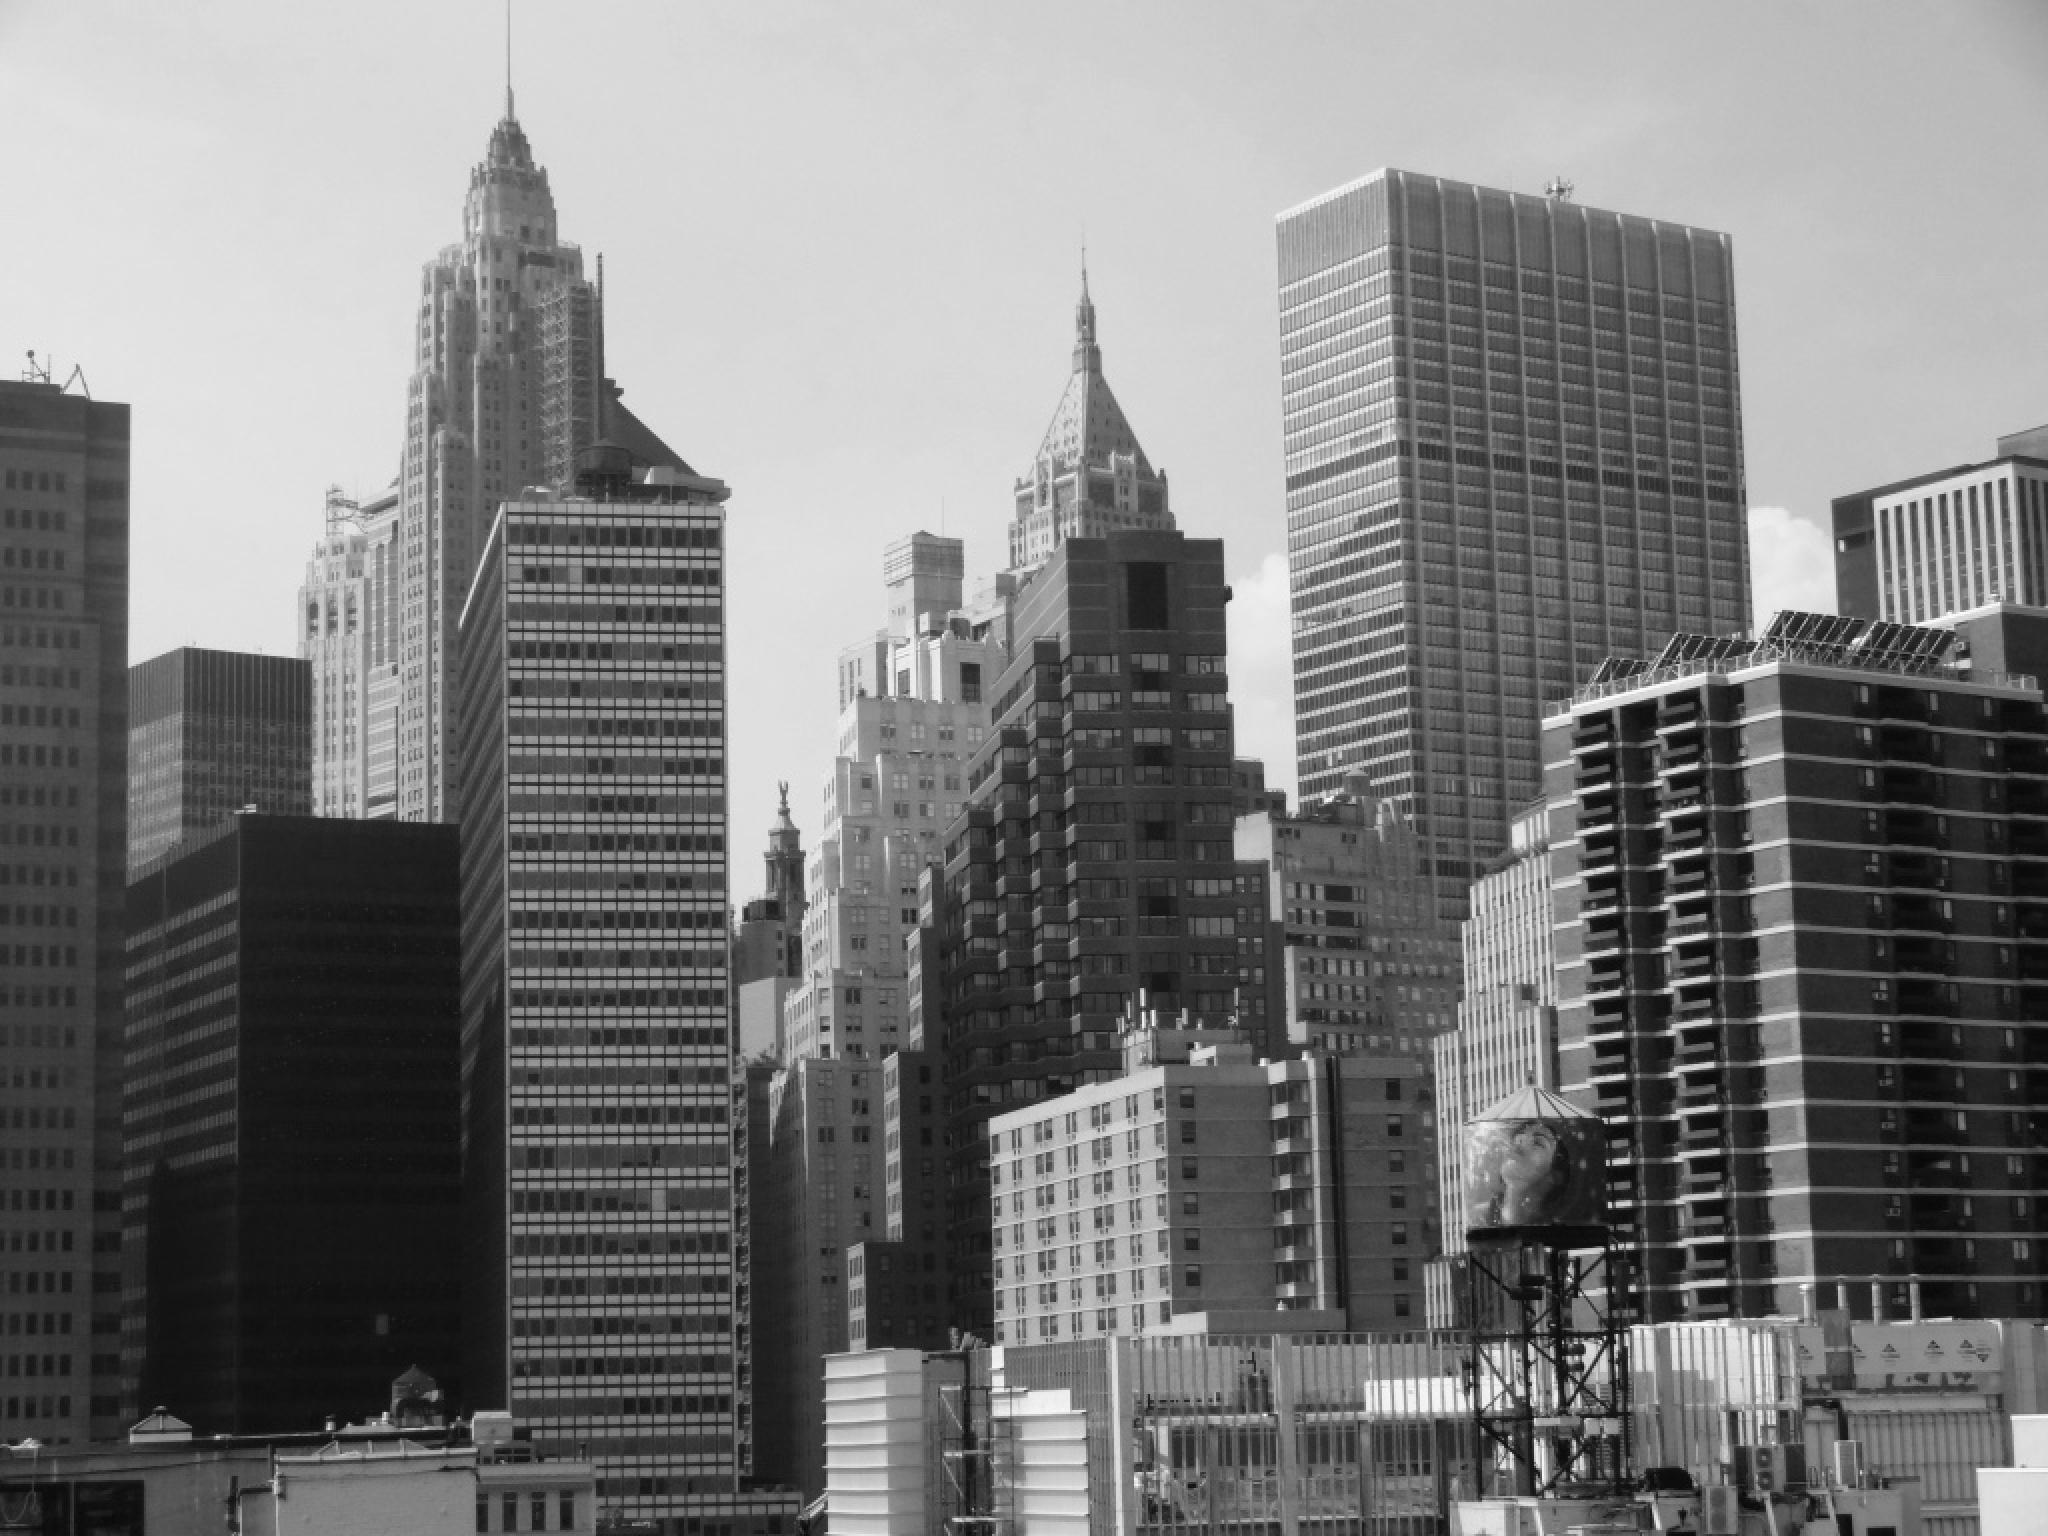 New York by samantha.jenkins.5030